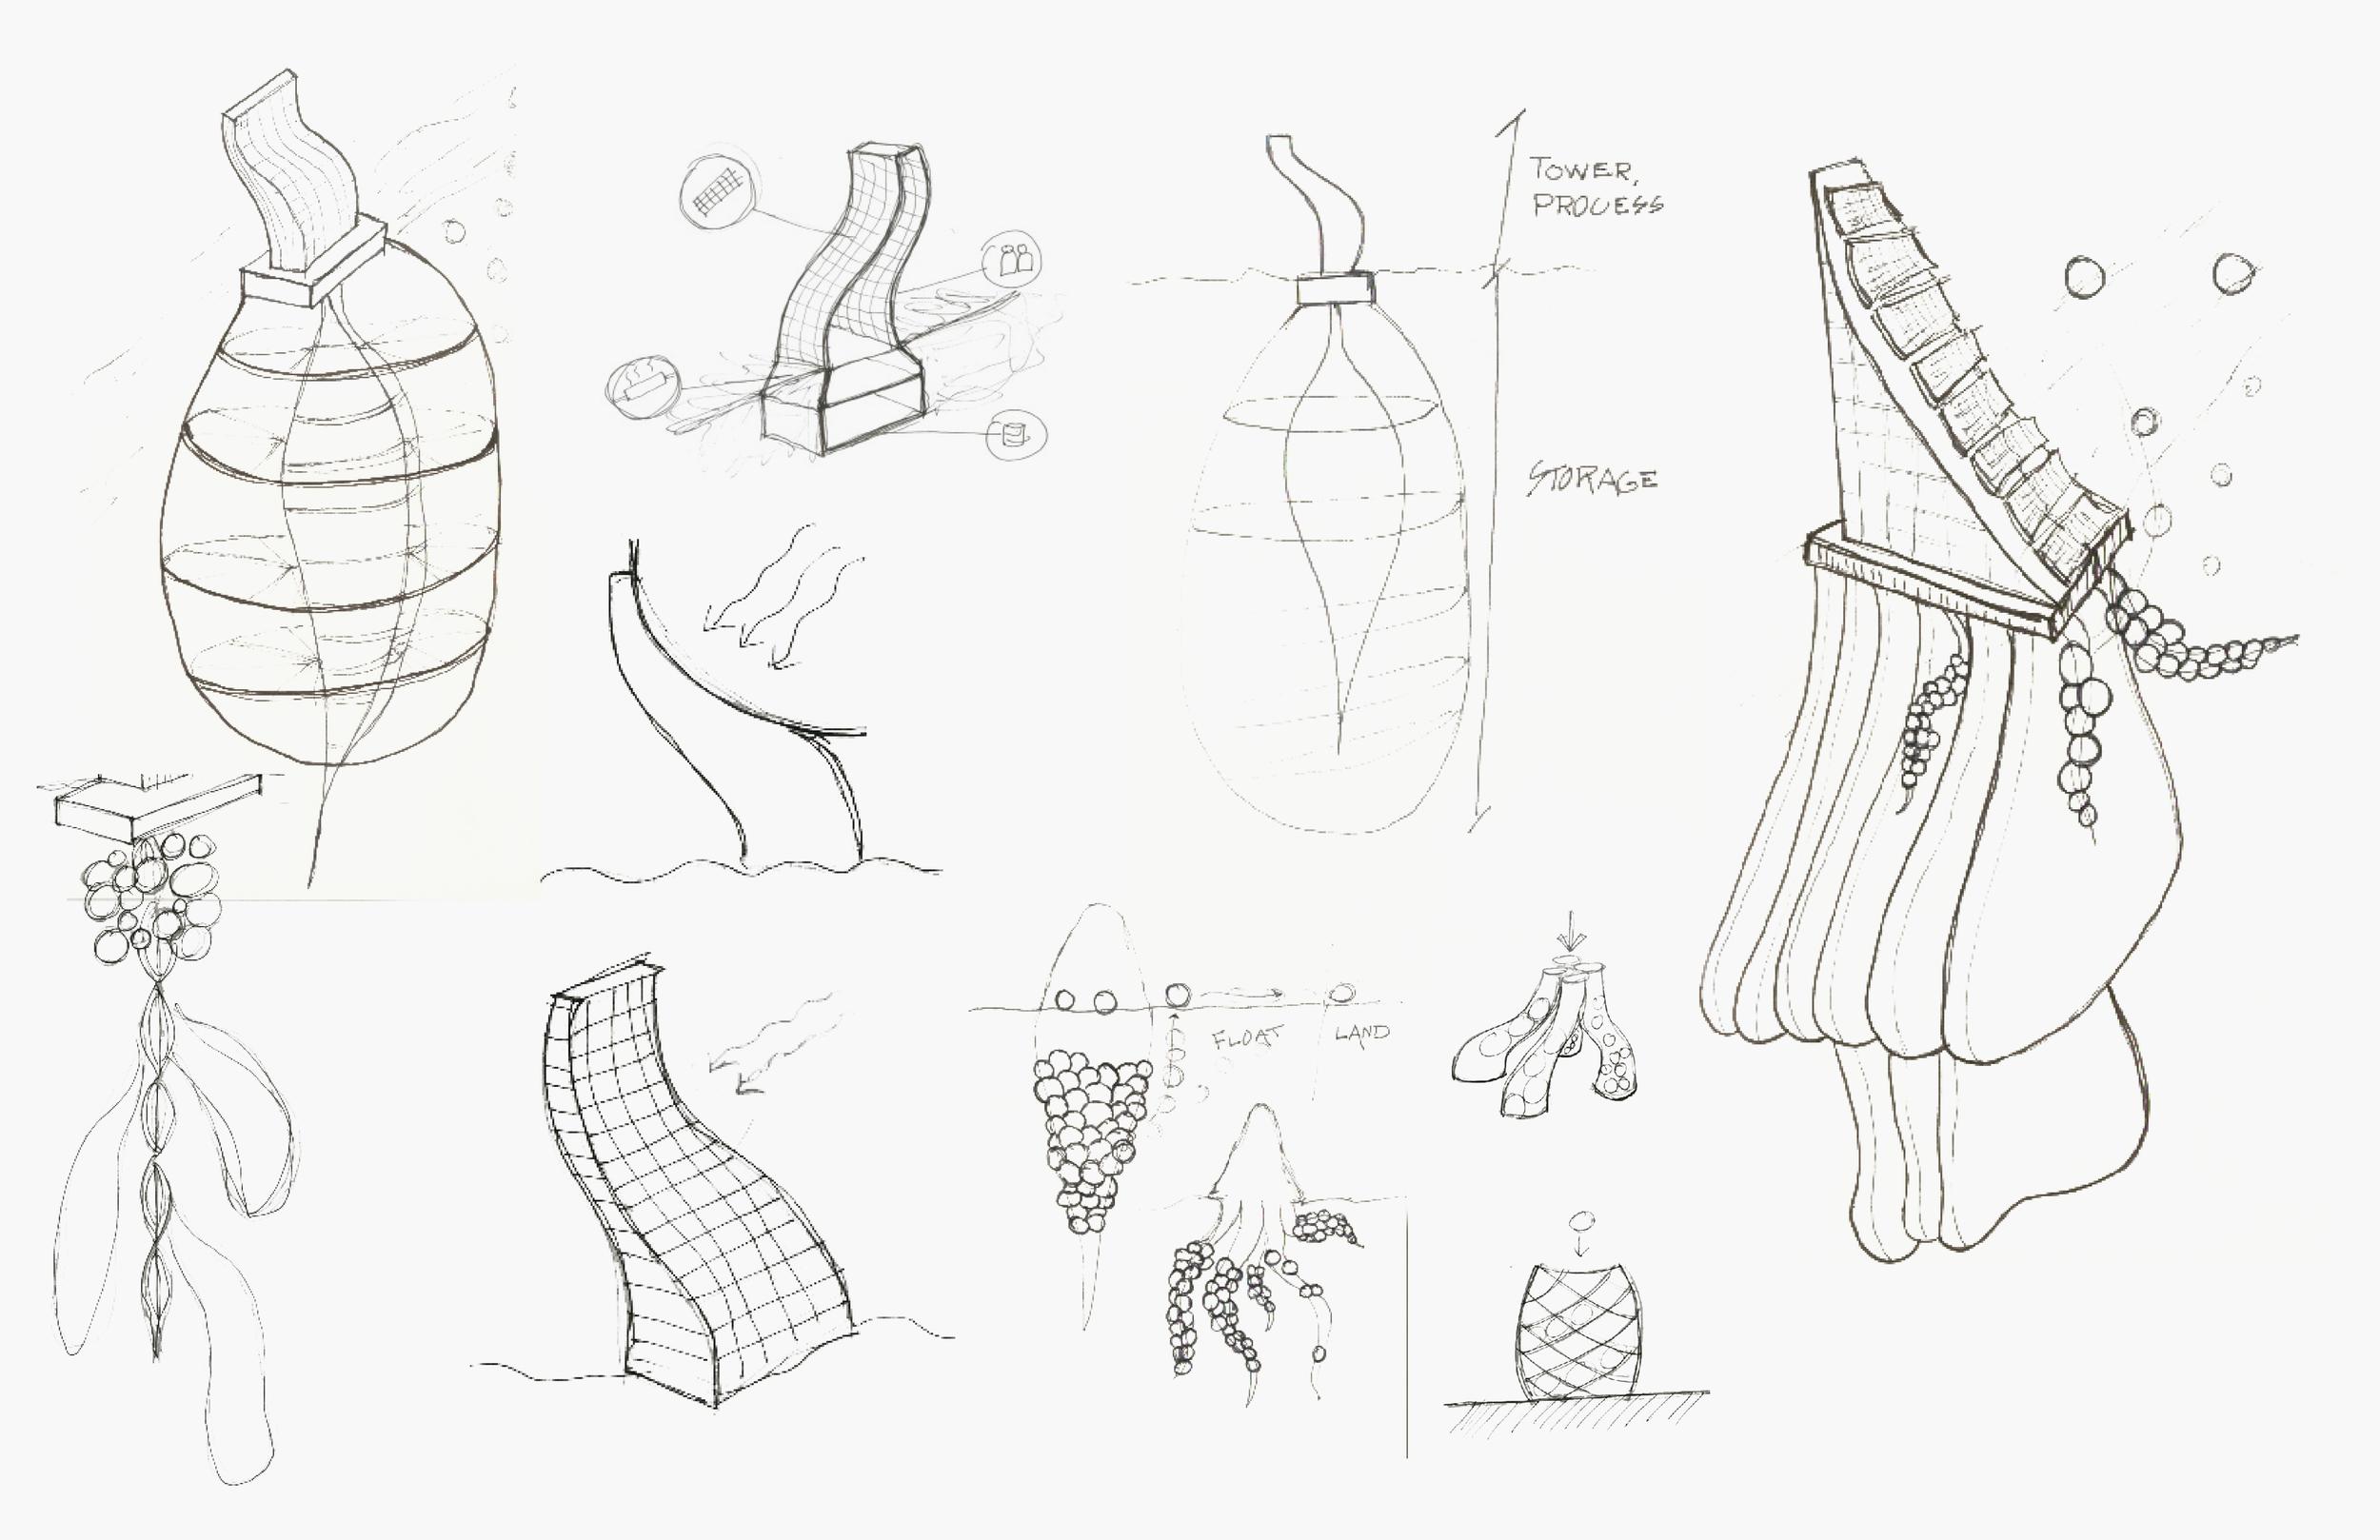 das_elutriator_sketches.png